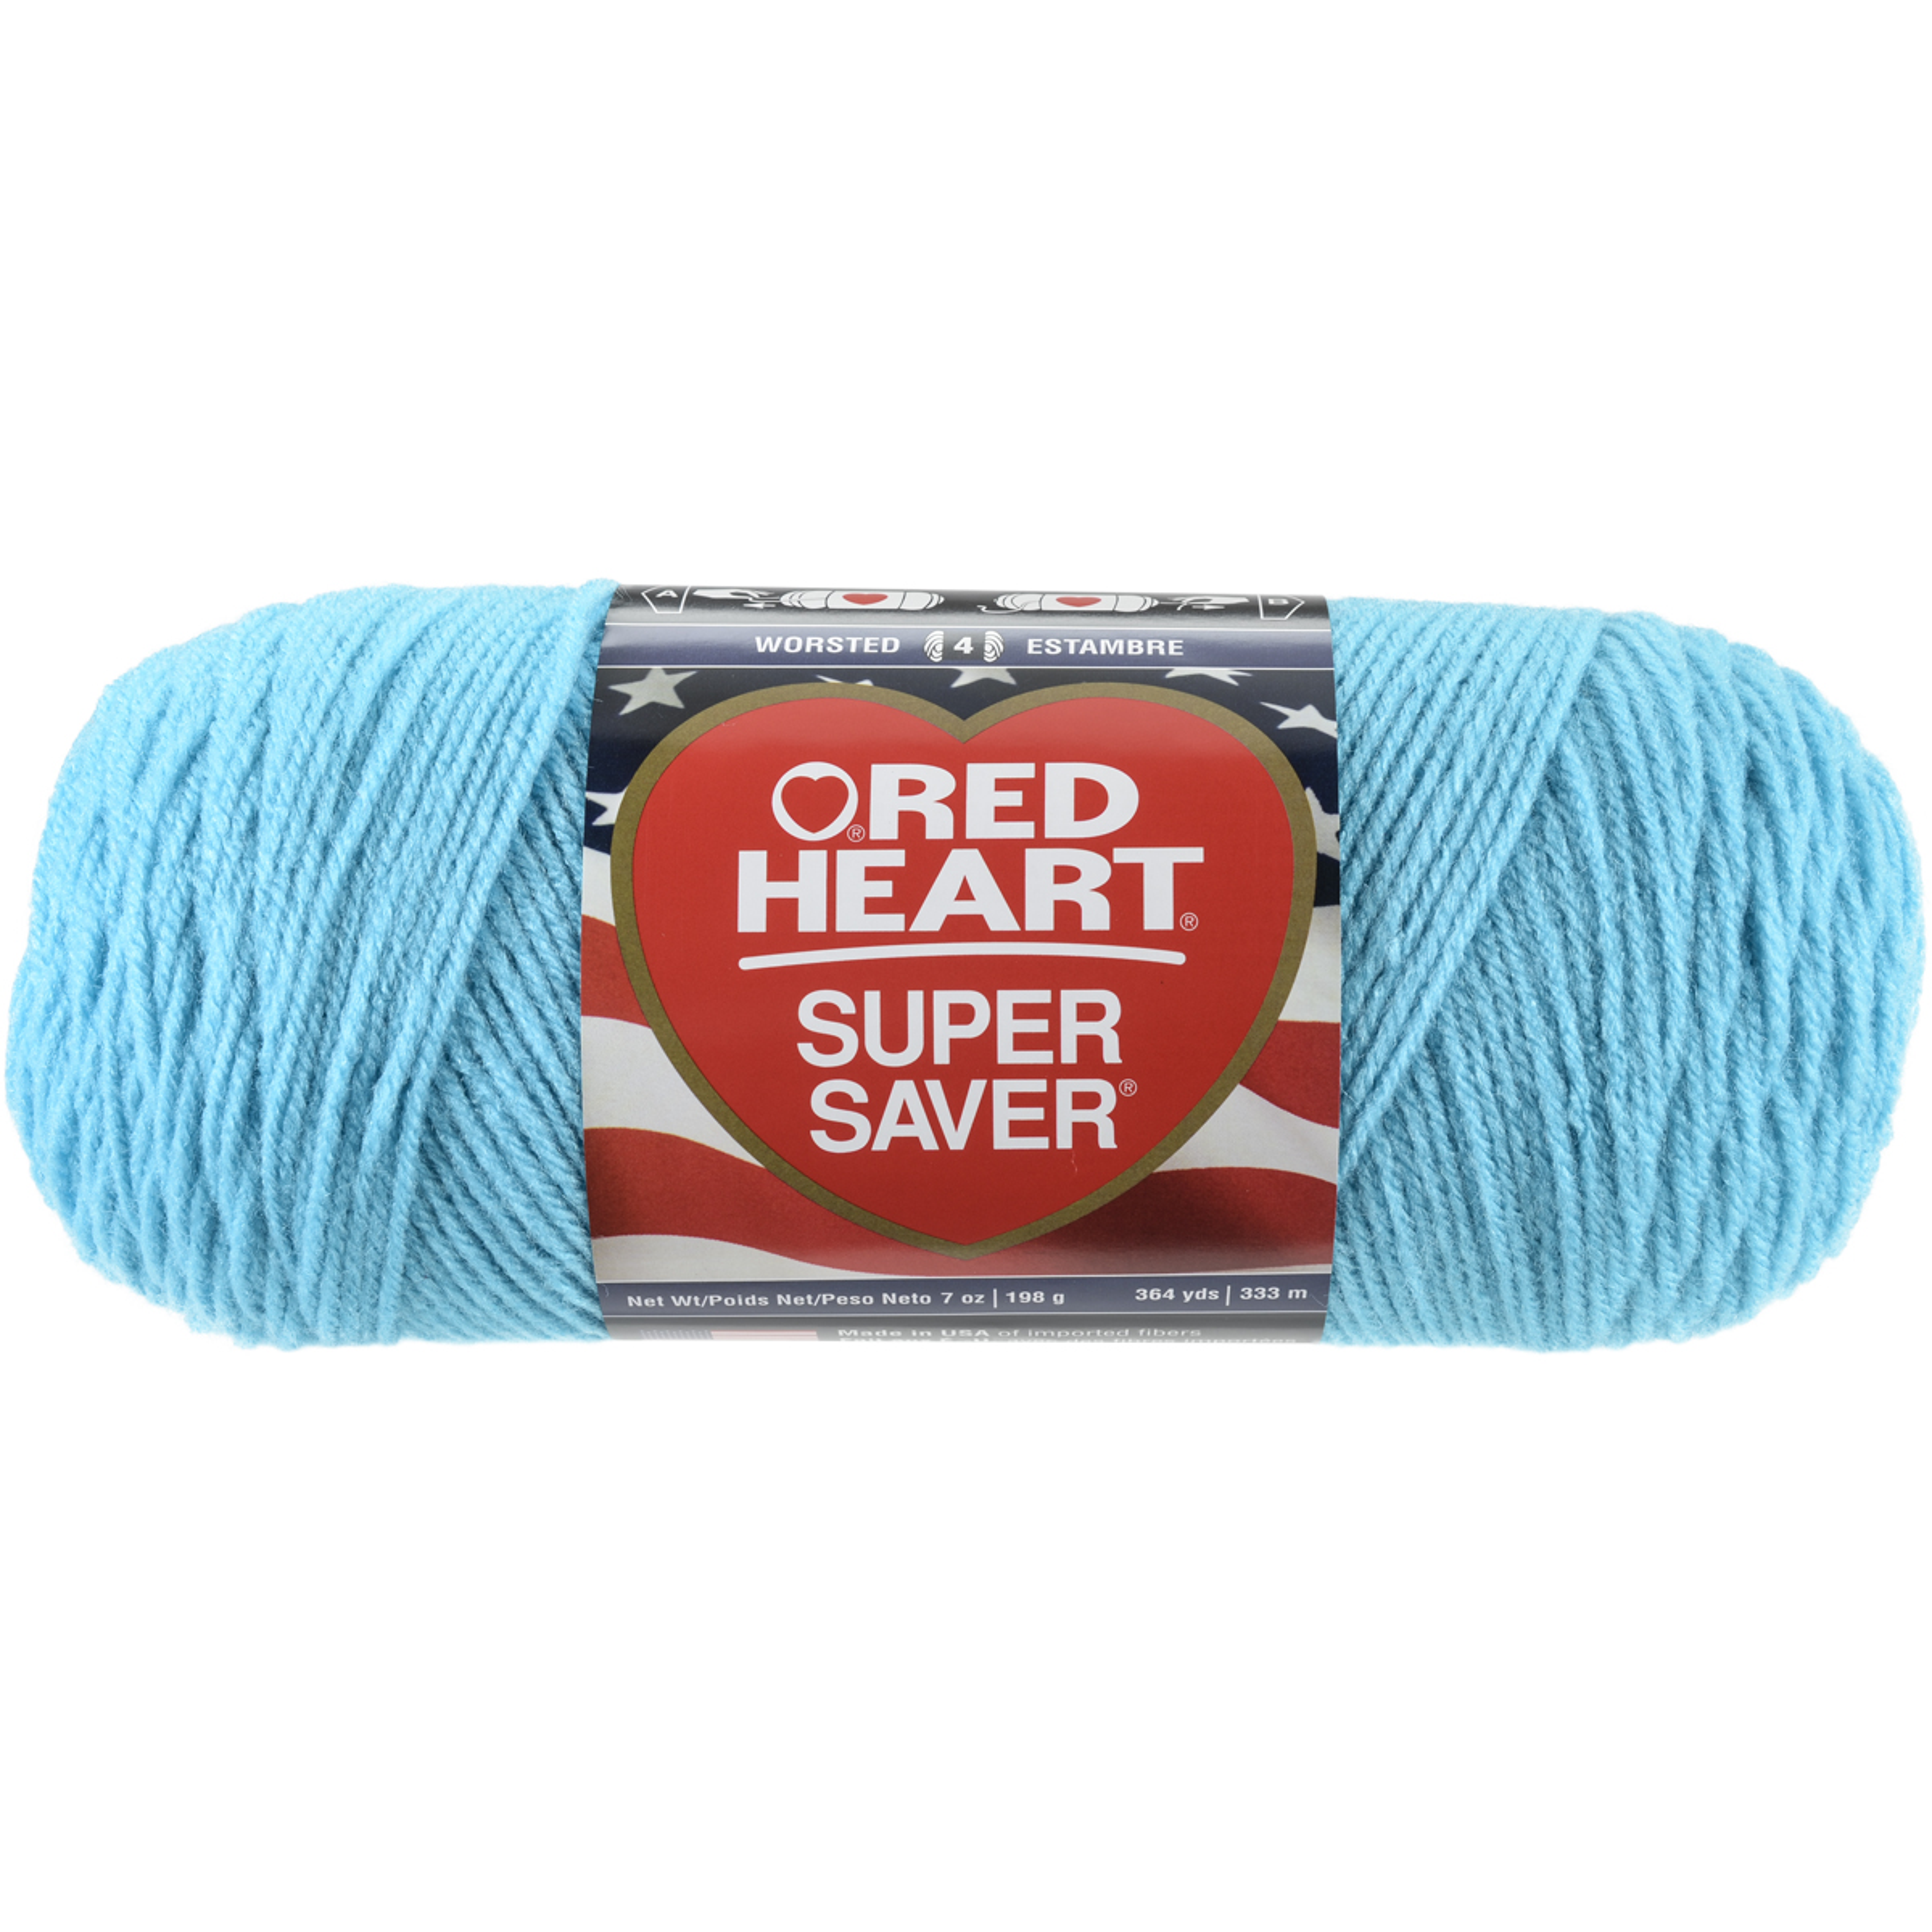 Red Heart/Super Saver Yarn Turqua